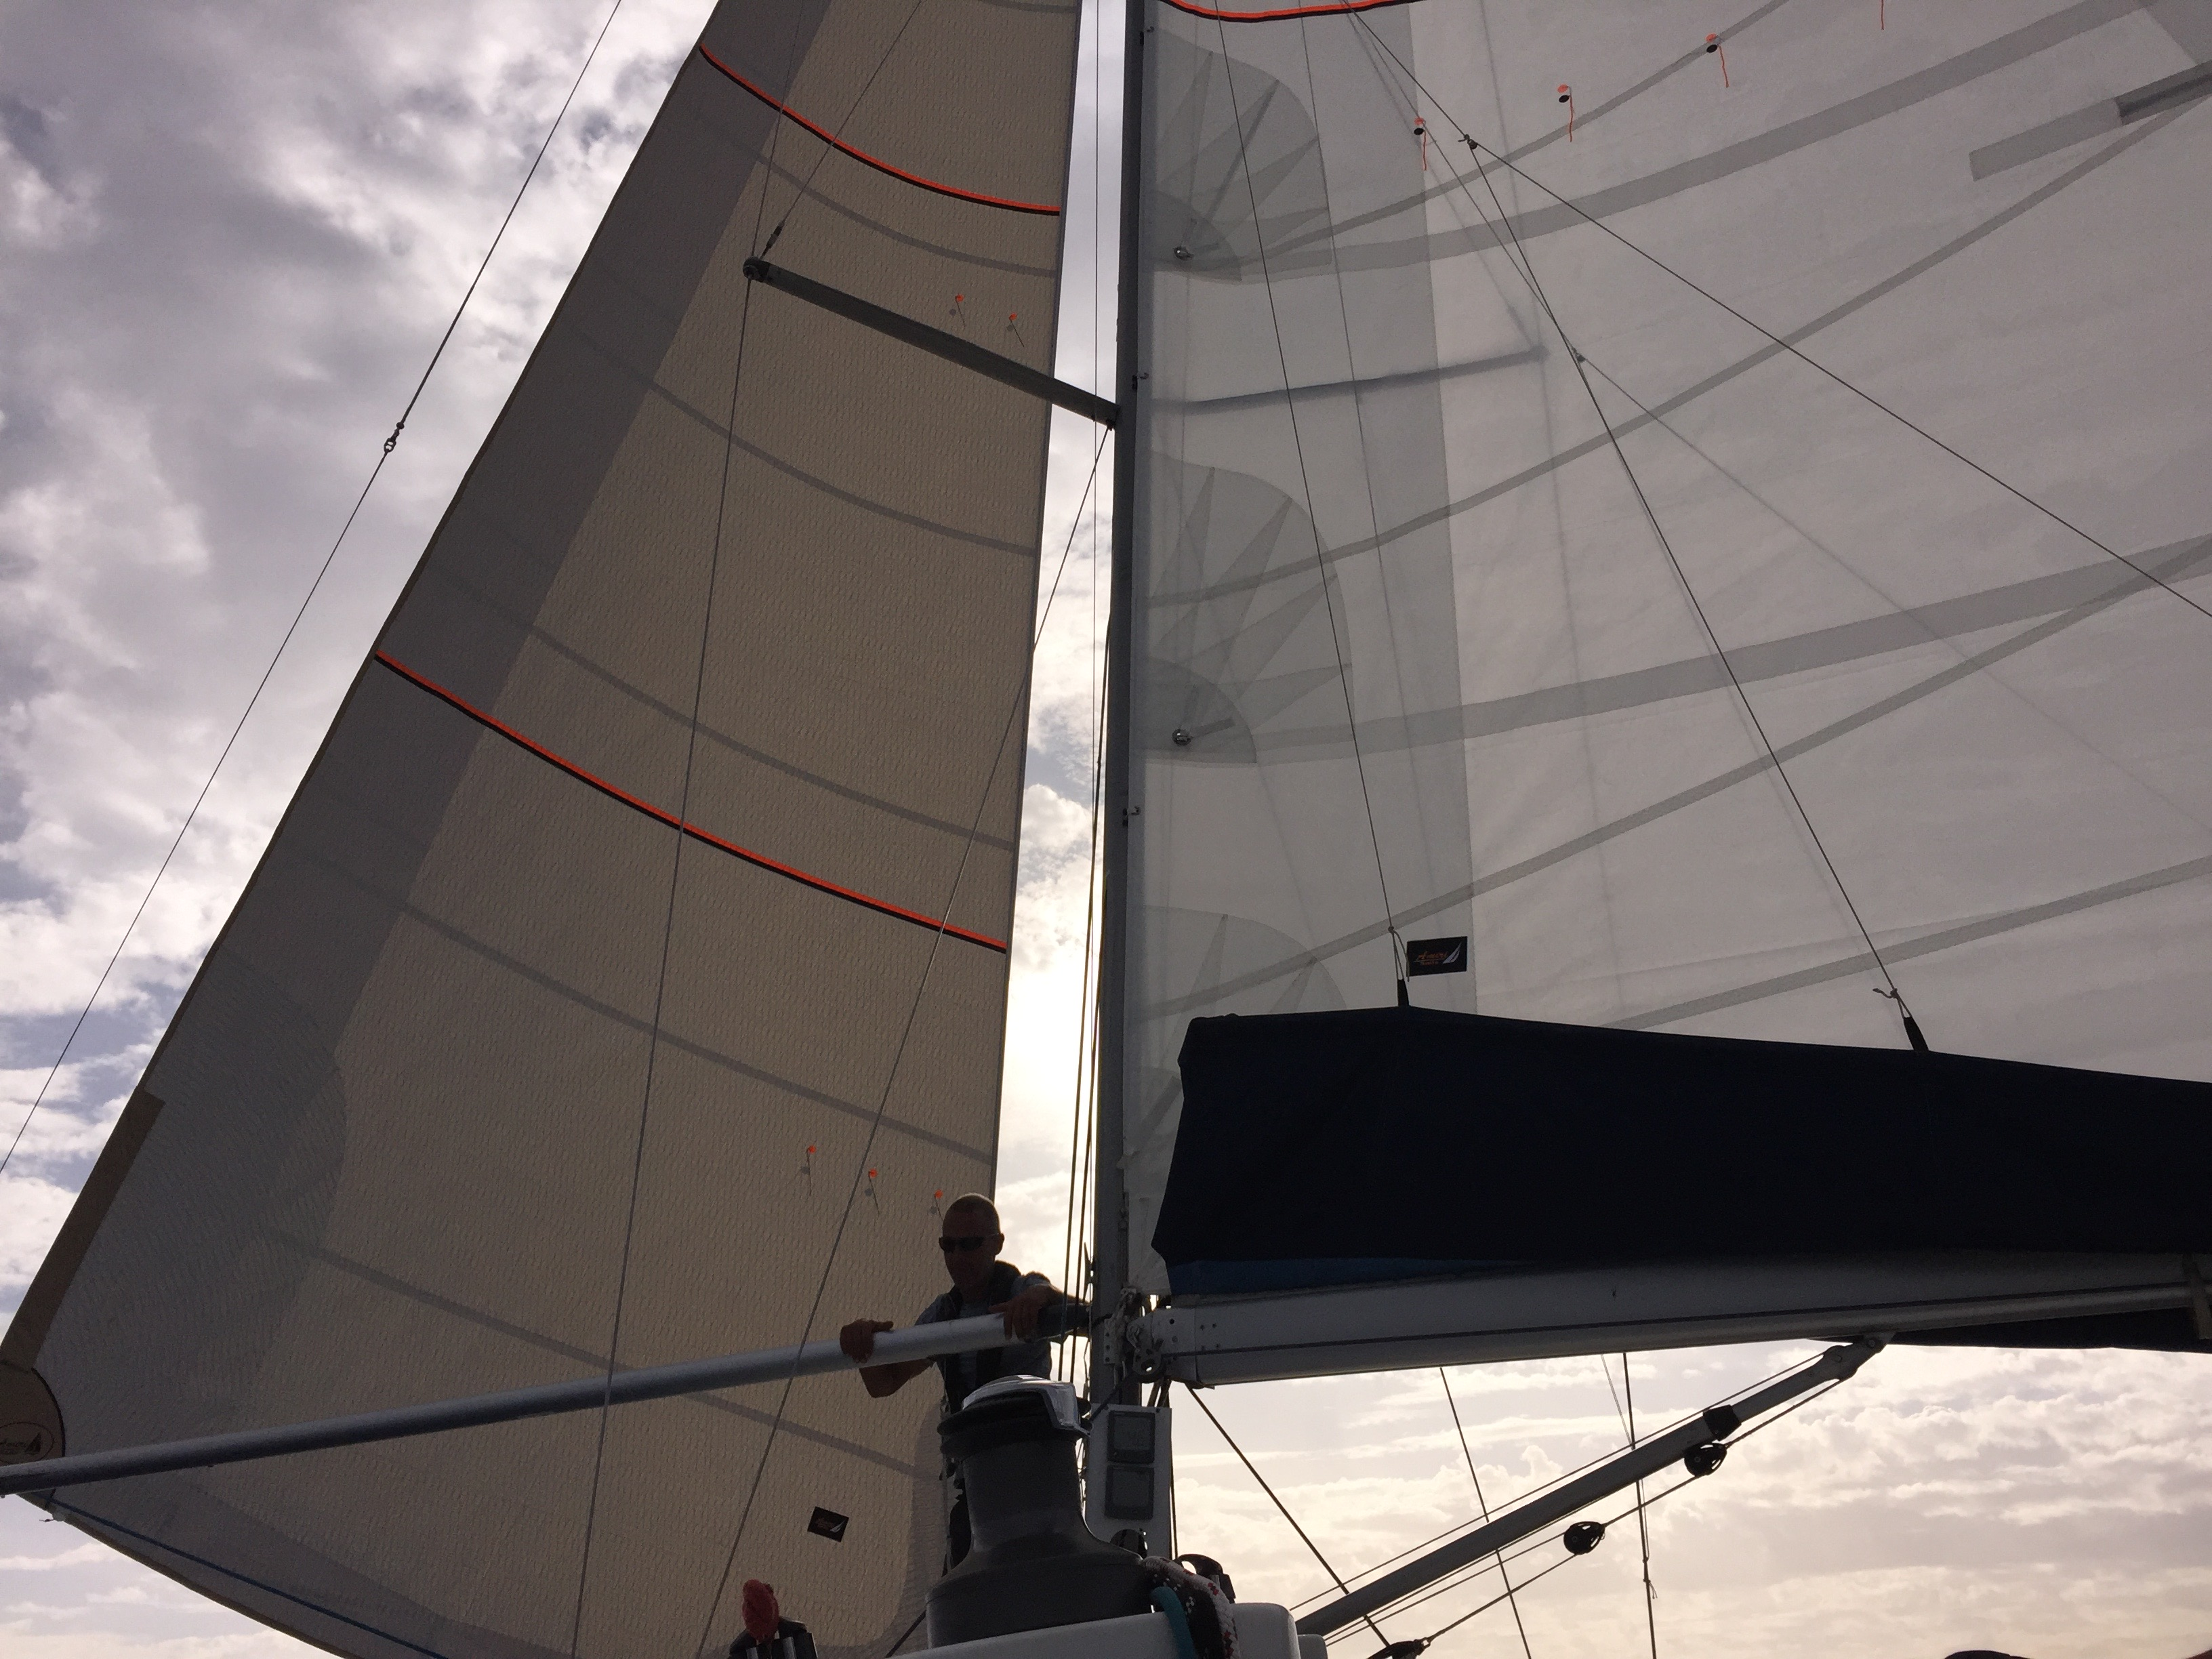 Yalla's brand new sails